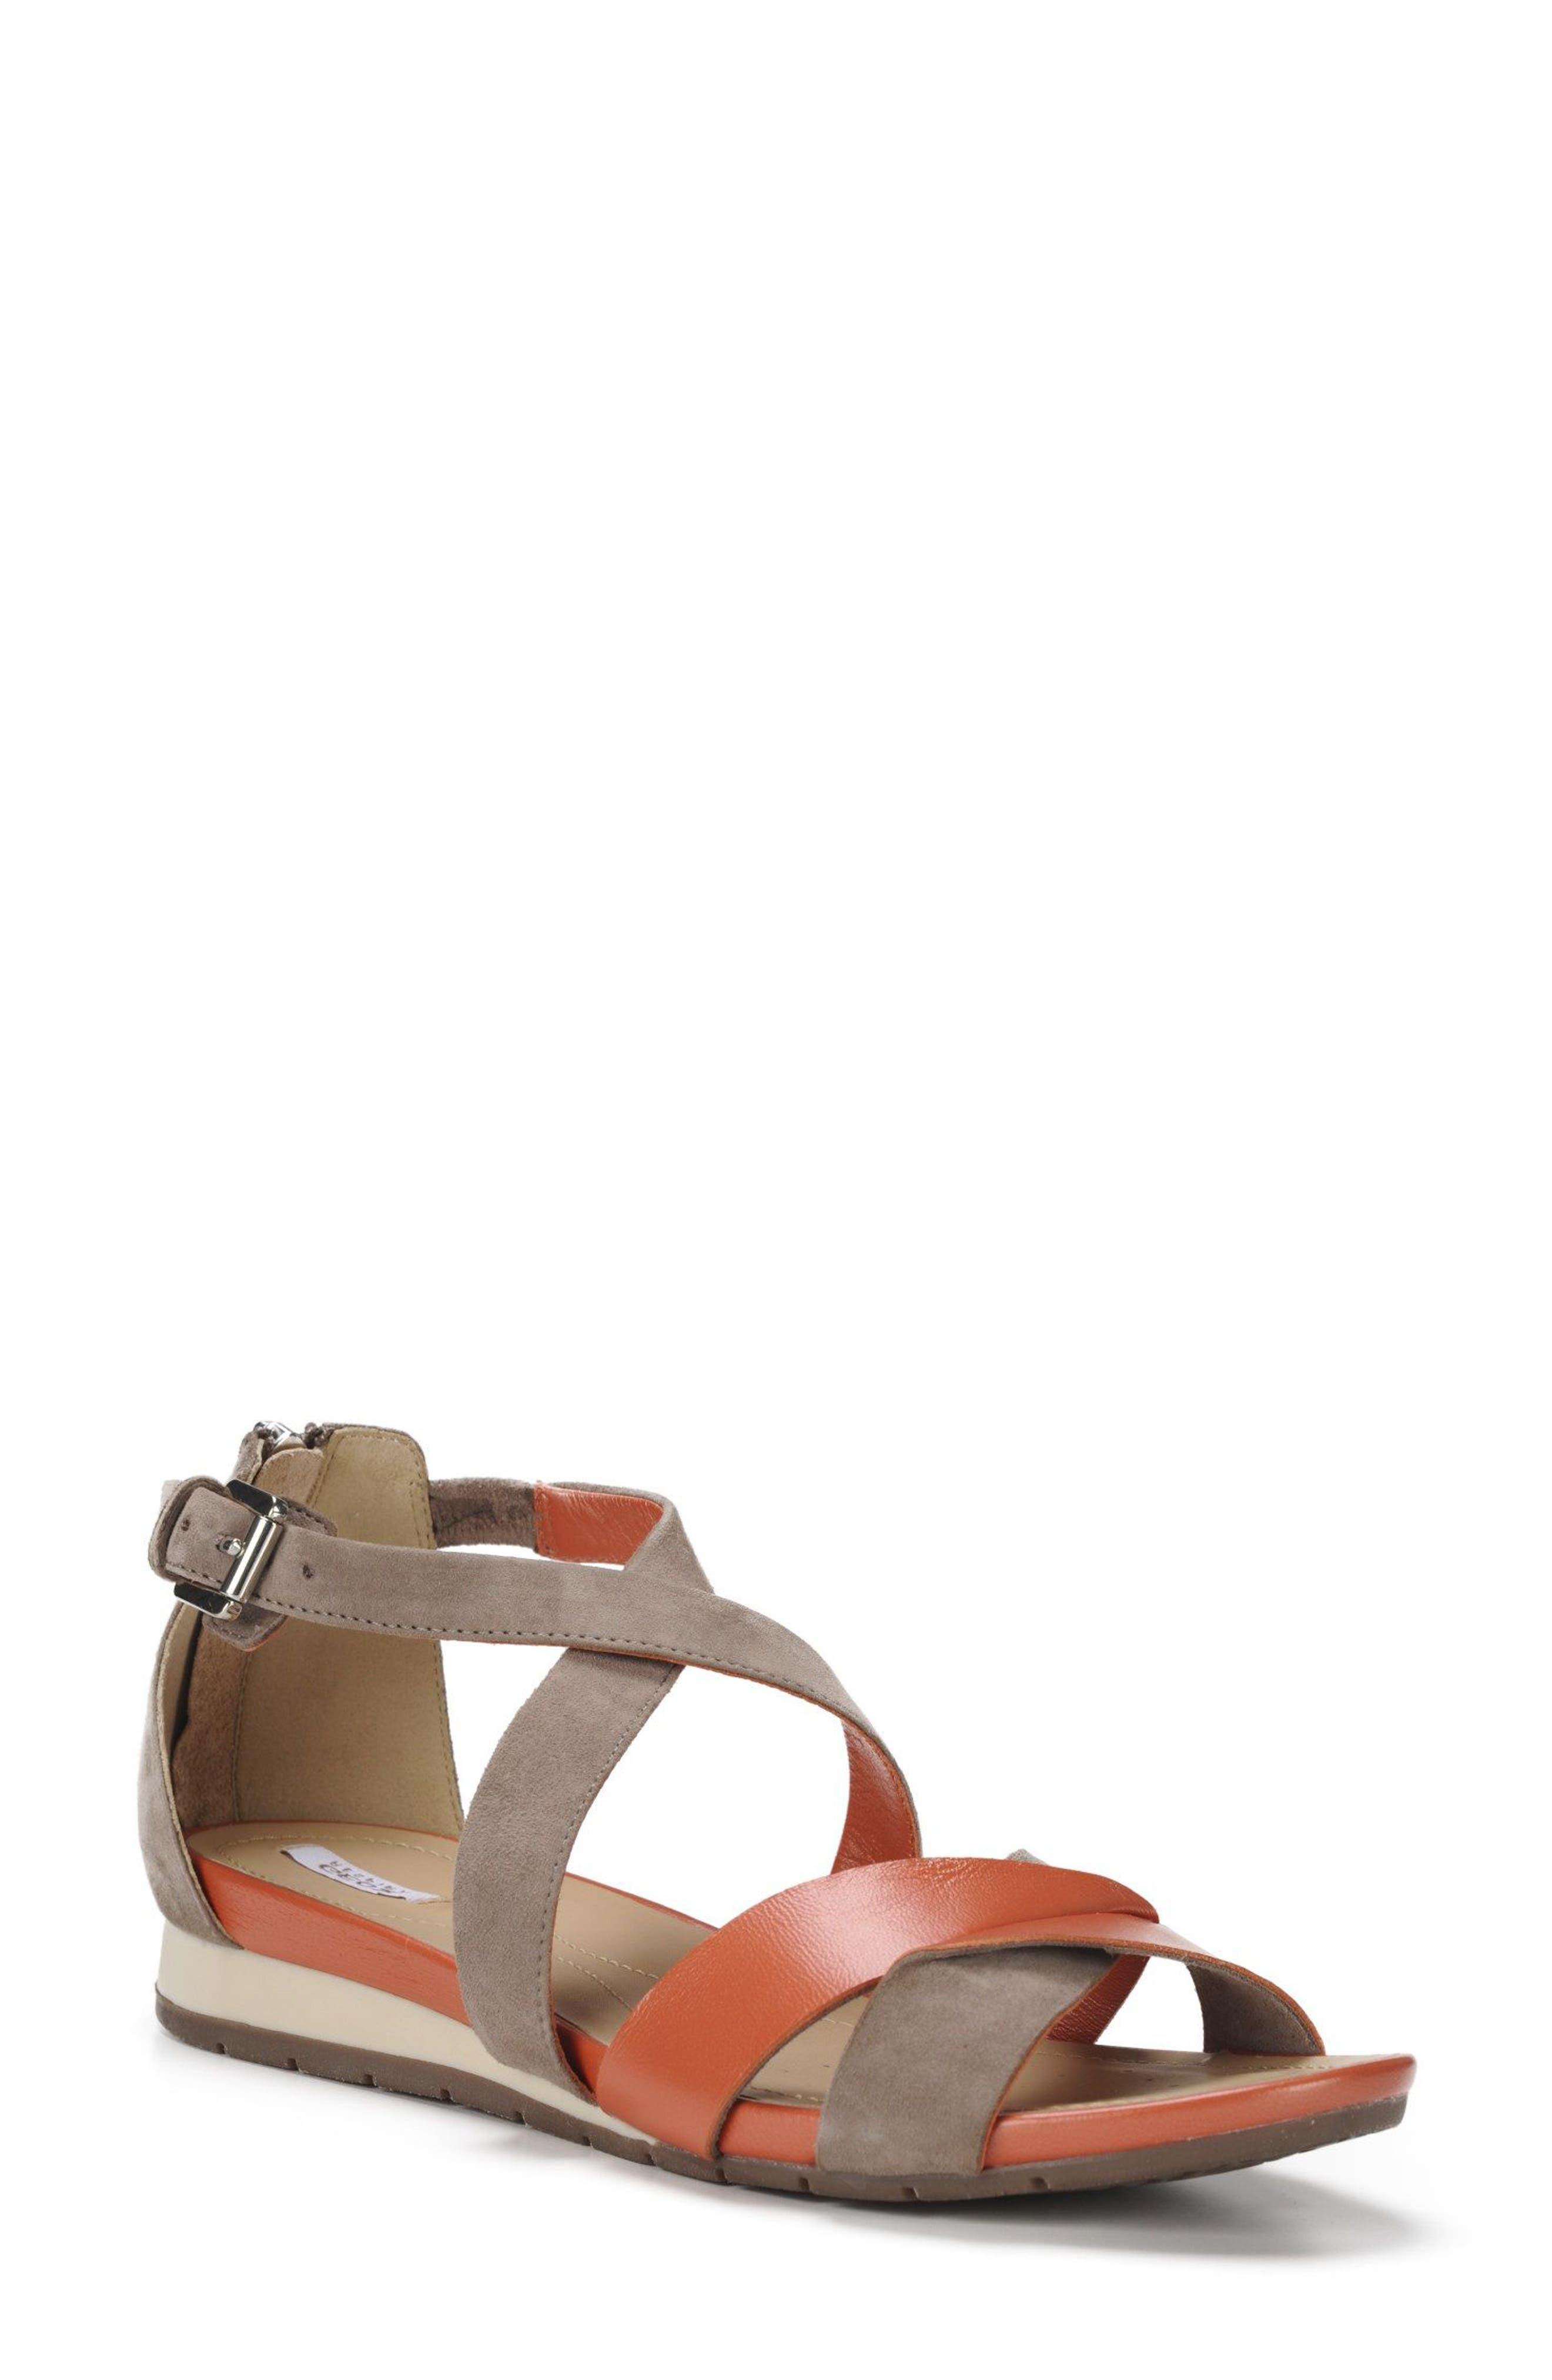 GEOX Formosa Sandal